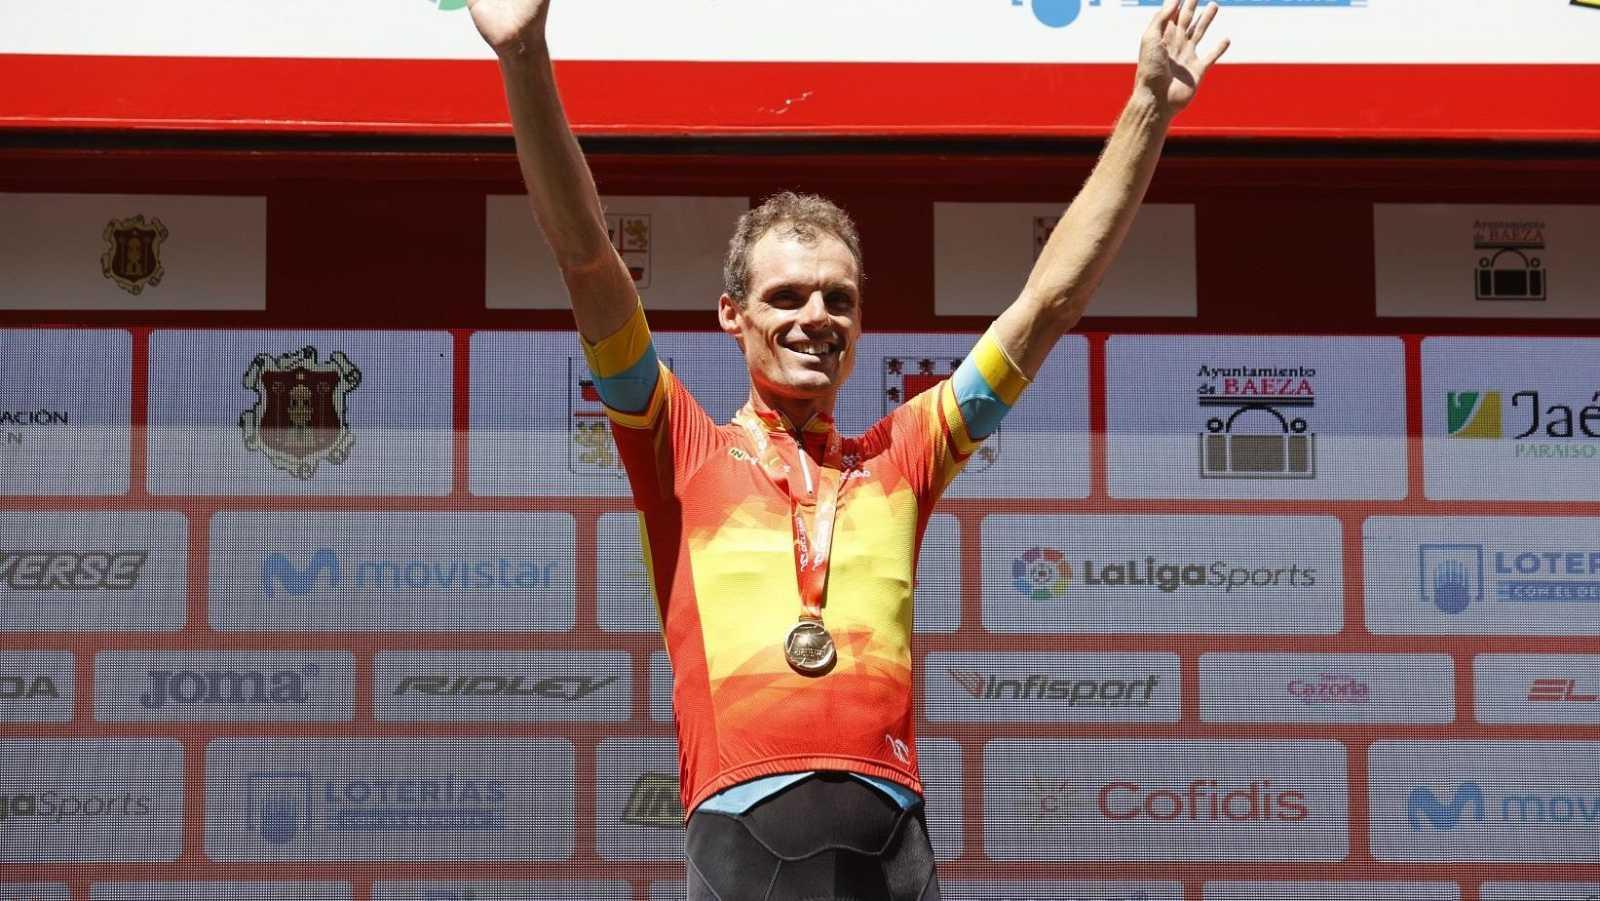 Luis León Sánchez, campeón de España de ciclismo en ruta